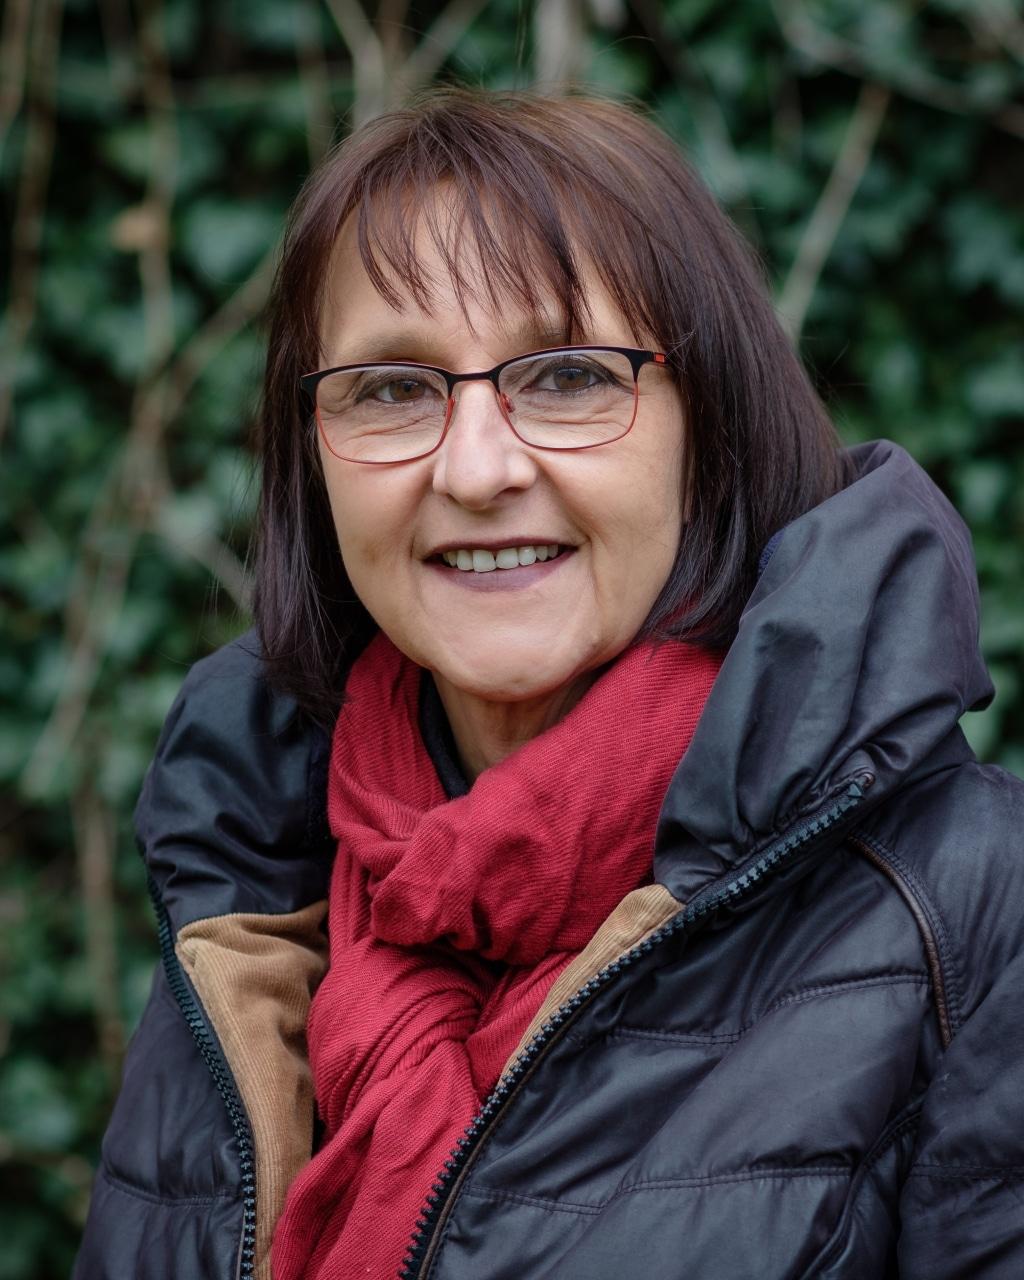 Elke Zach-Tassati